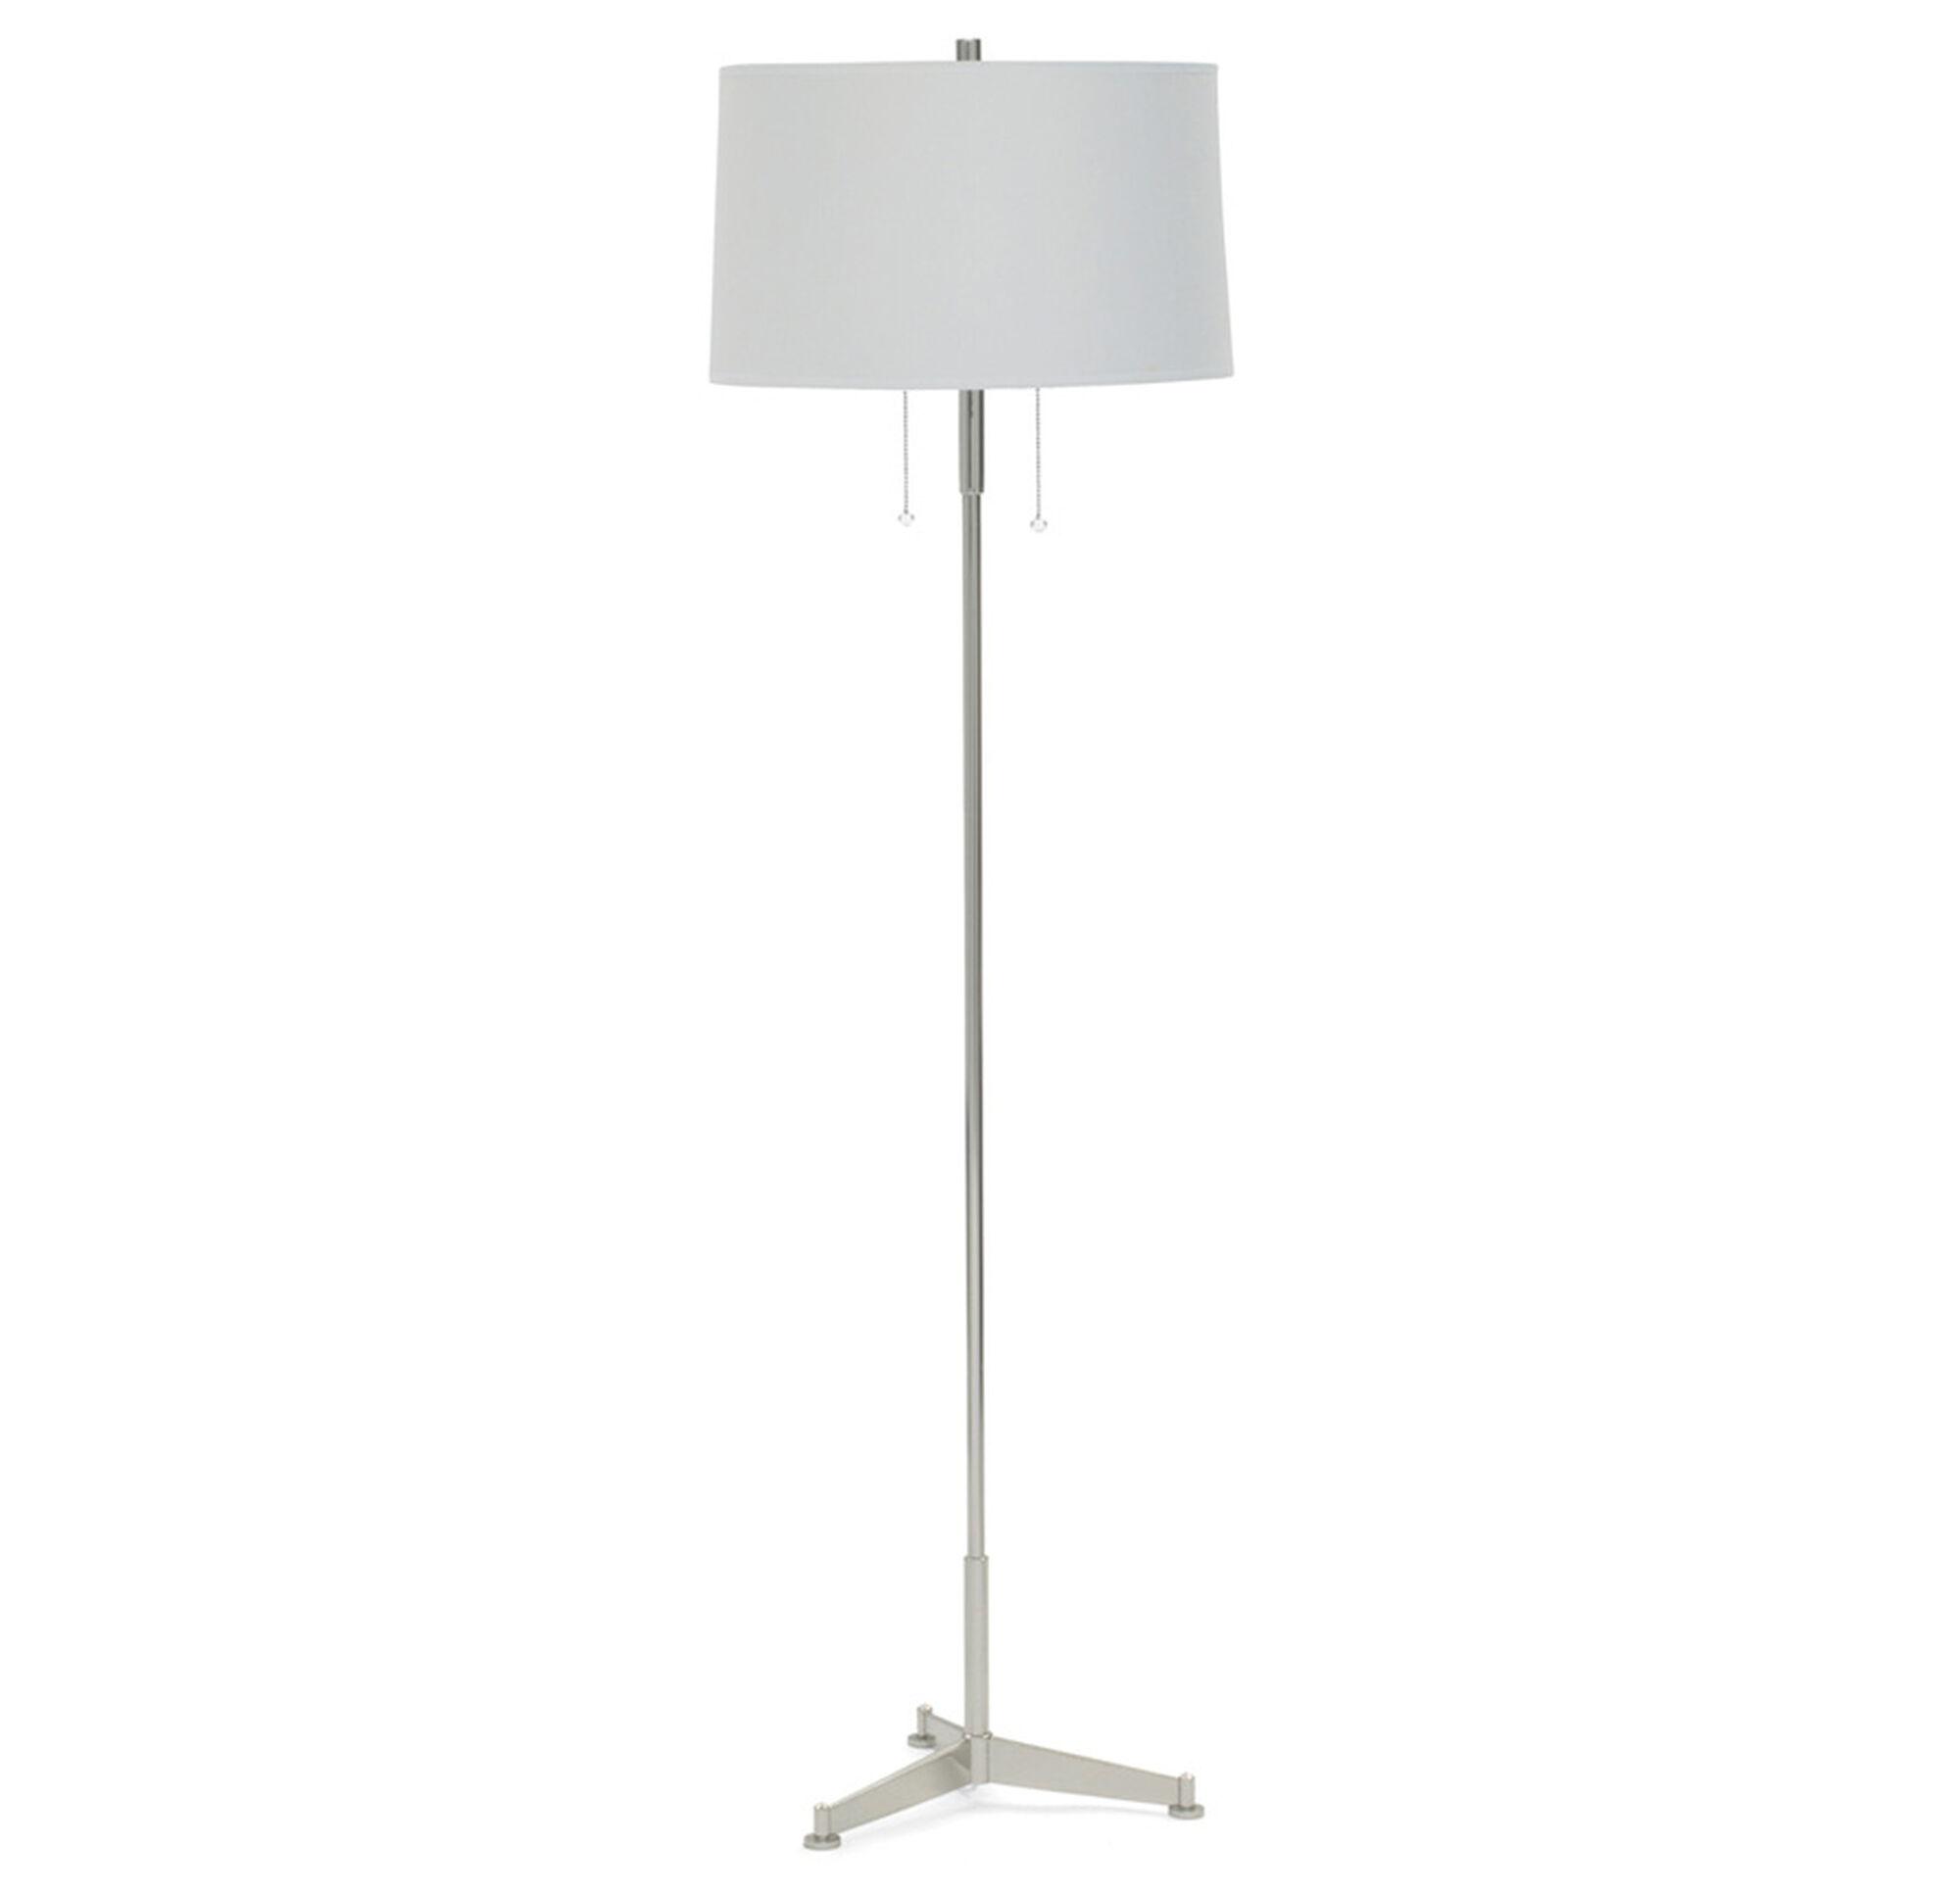 PIPER FLOOR LAMP POLISHED NICKEL